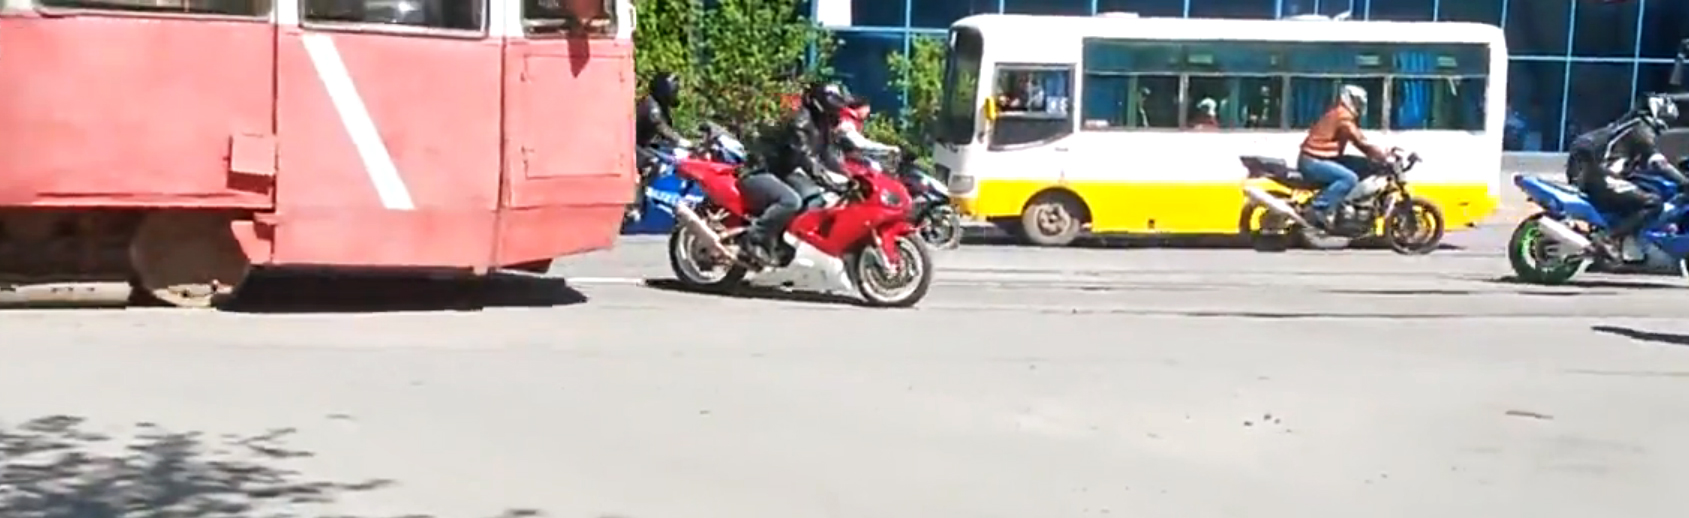 Accident incredibil in Kazahstan. Un tramvai fara vatman a intrat in plin in motociclisti. VIDEO